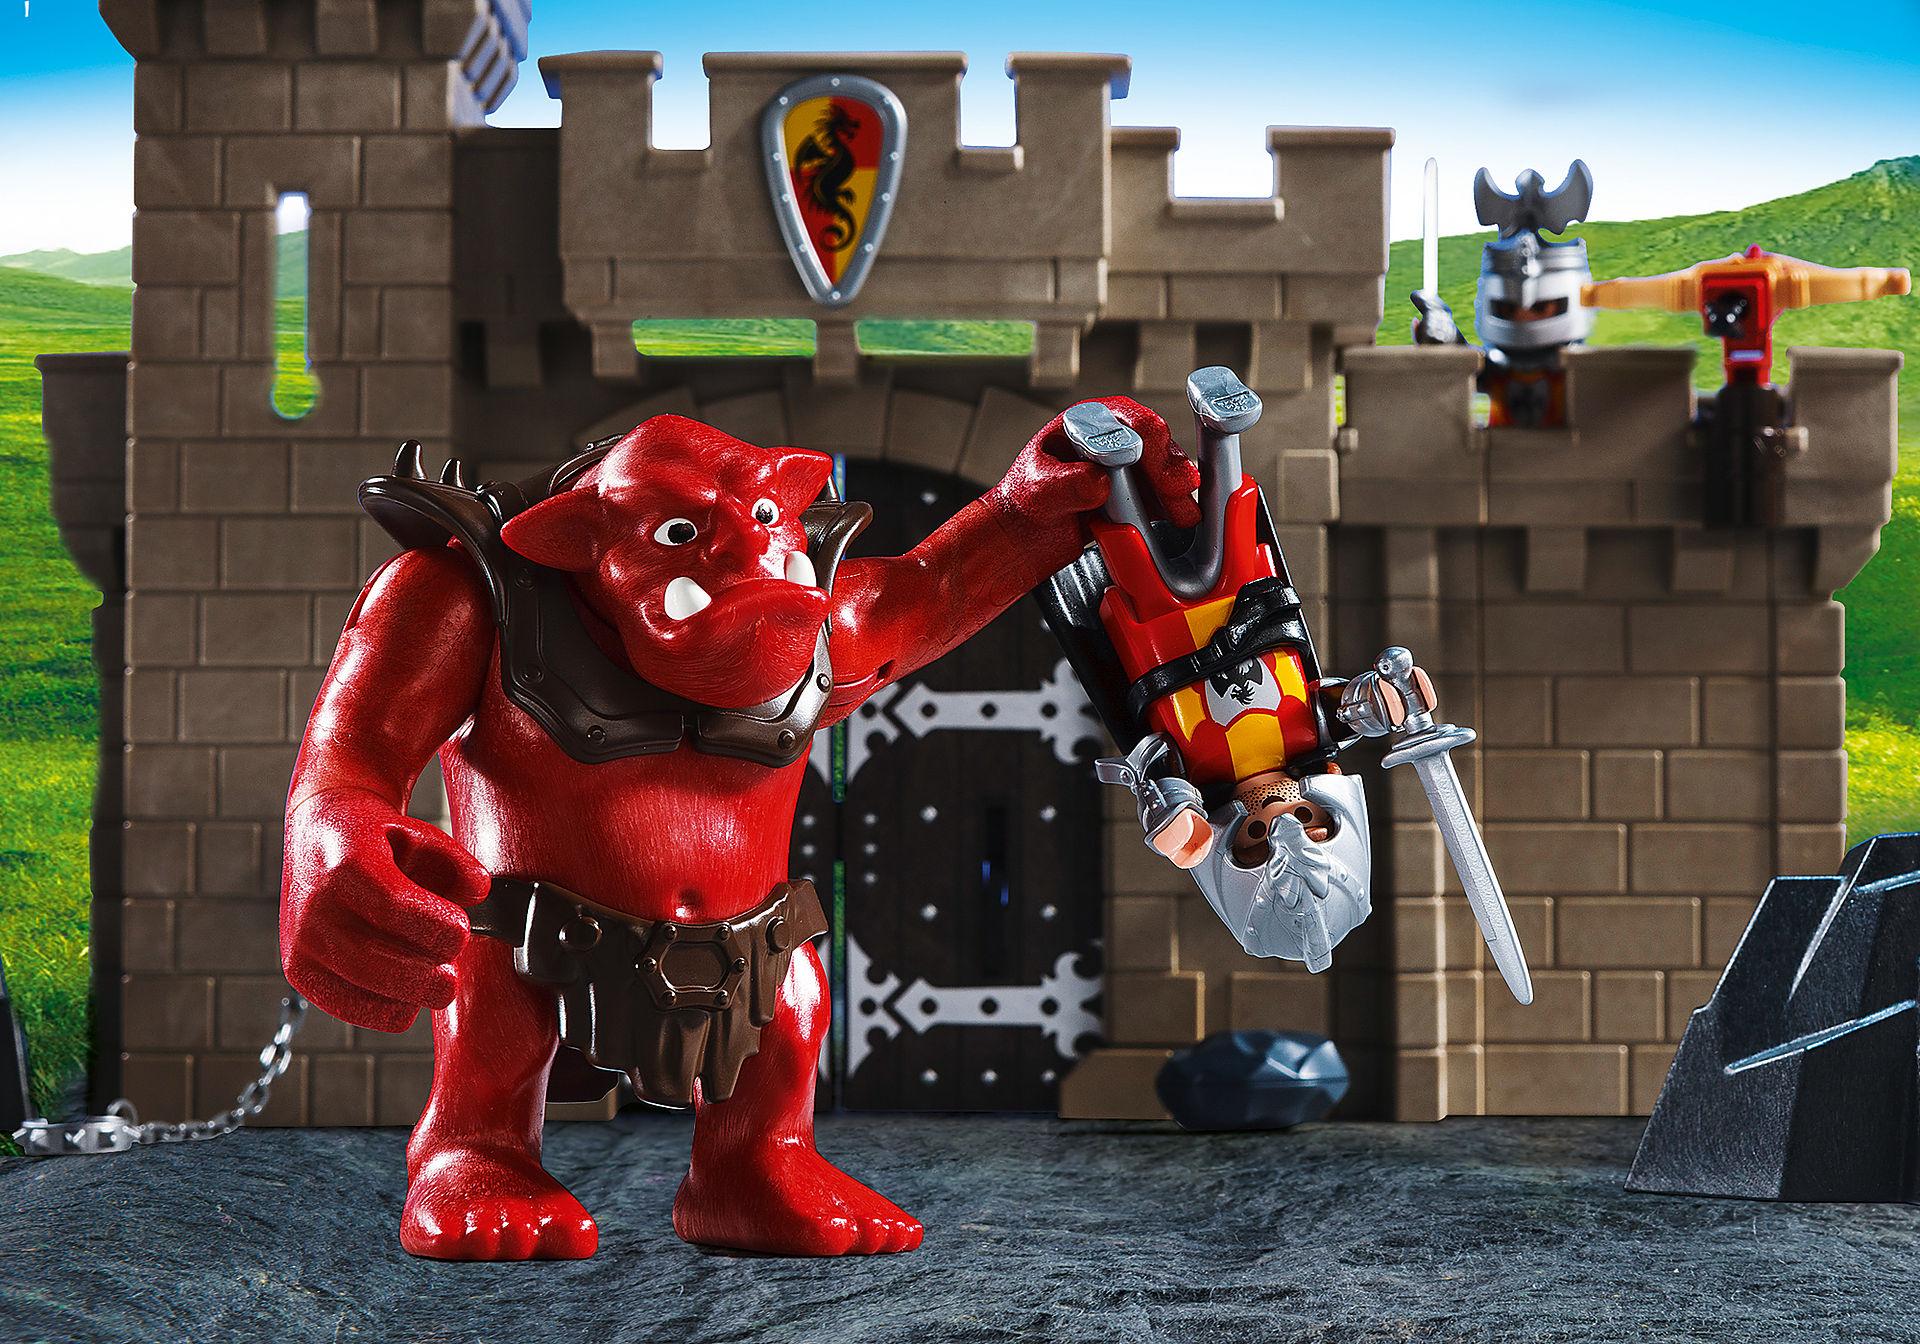 http://media.playmobil.com/i/playmobil/5670_product_extra2/Knights Castle Club Set